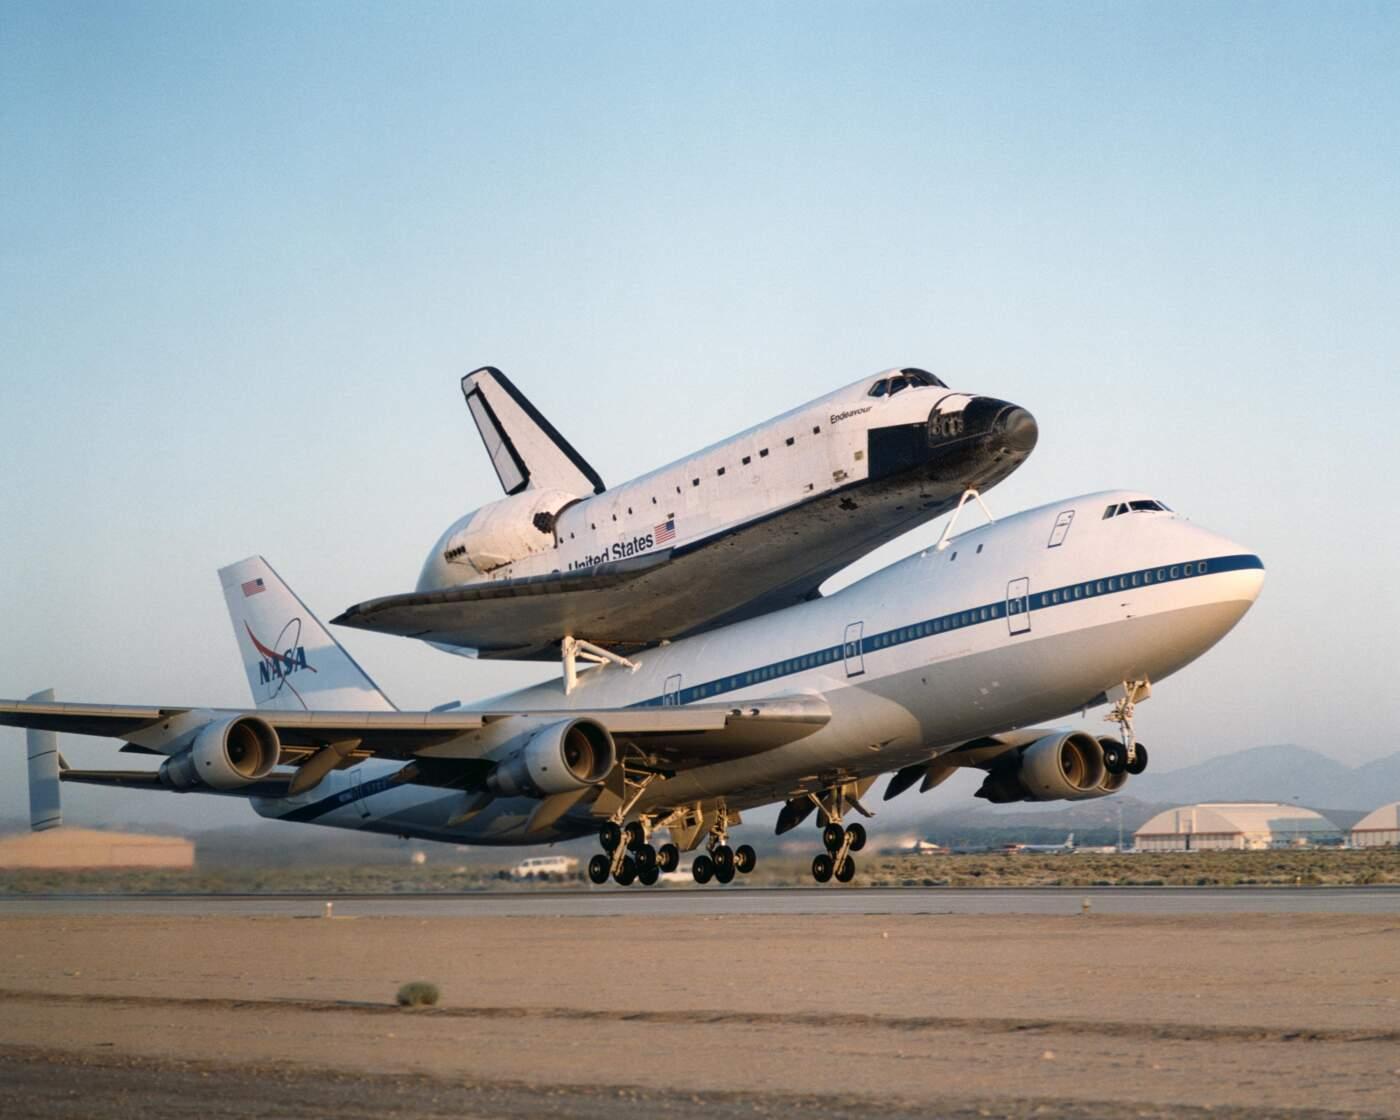 NASA Boeing 747